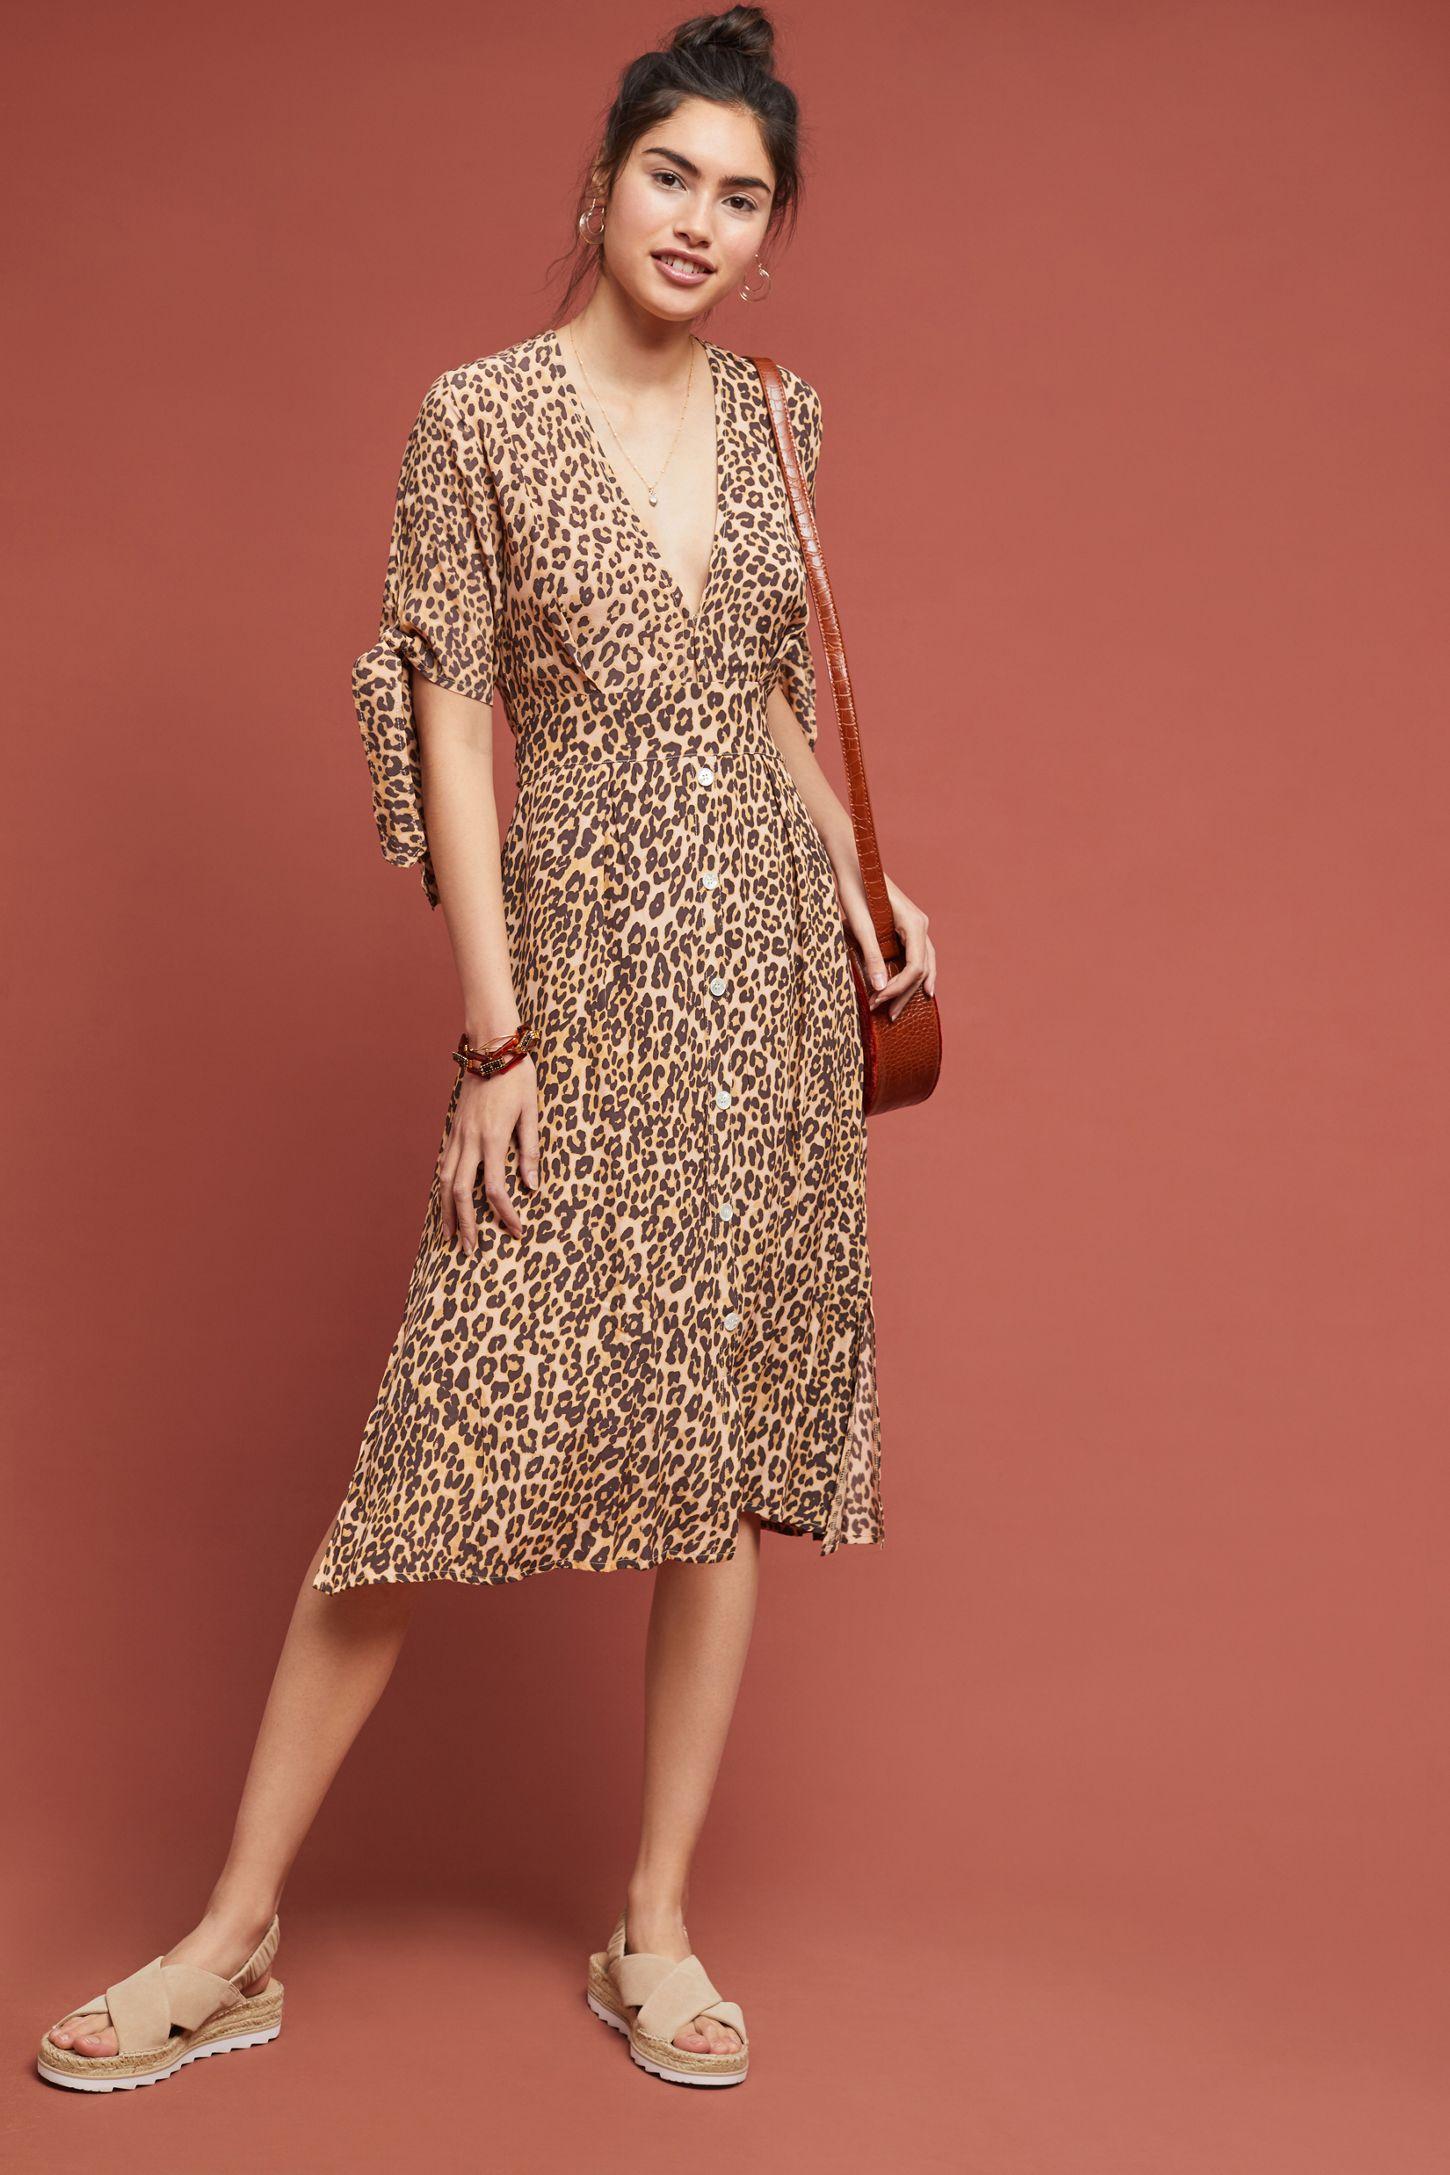 bddb4df06876 Faithfull Leopard Midi Dress | Anthropologie